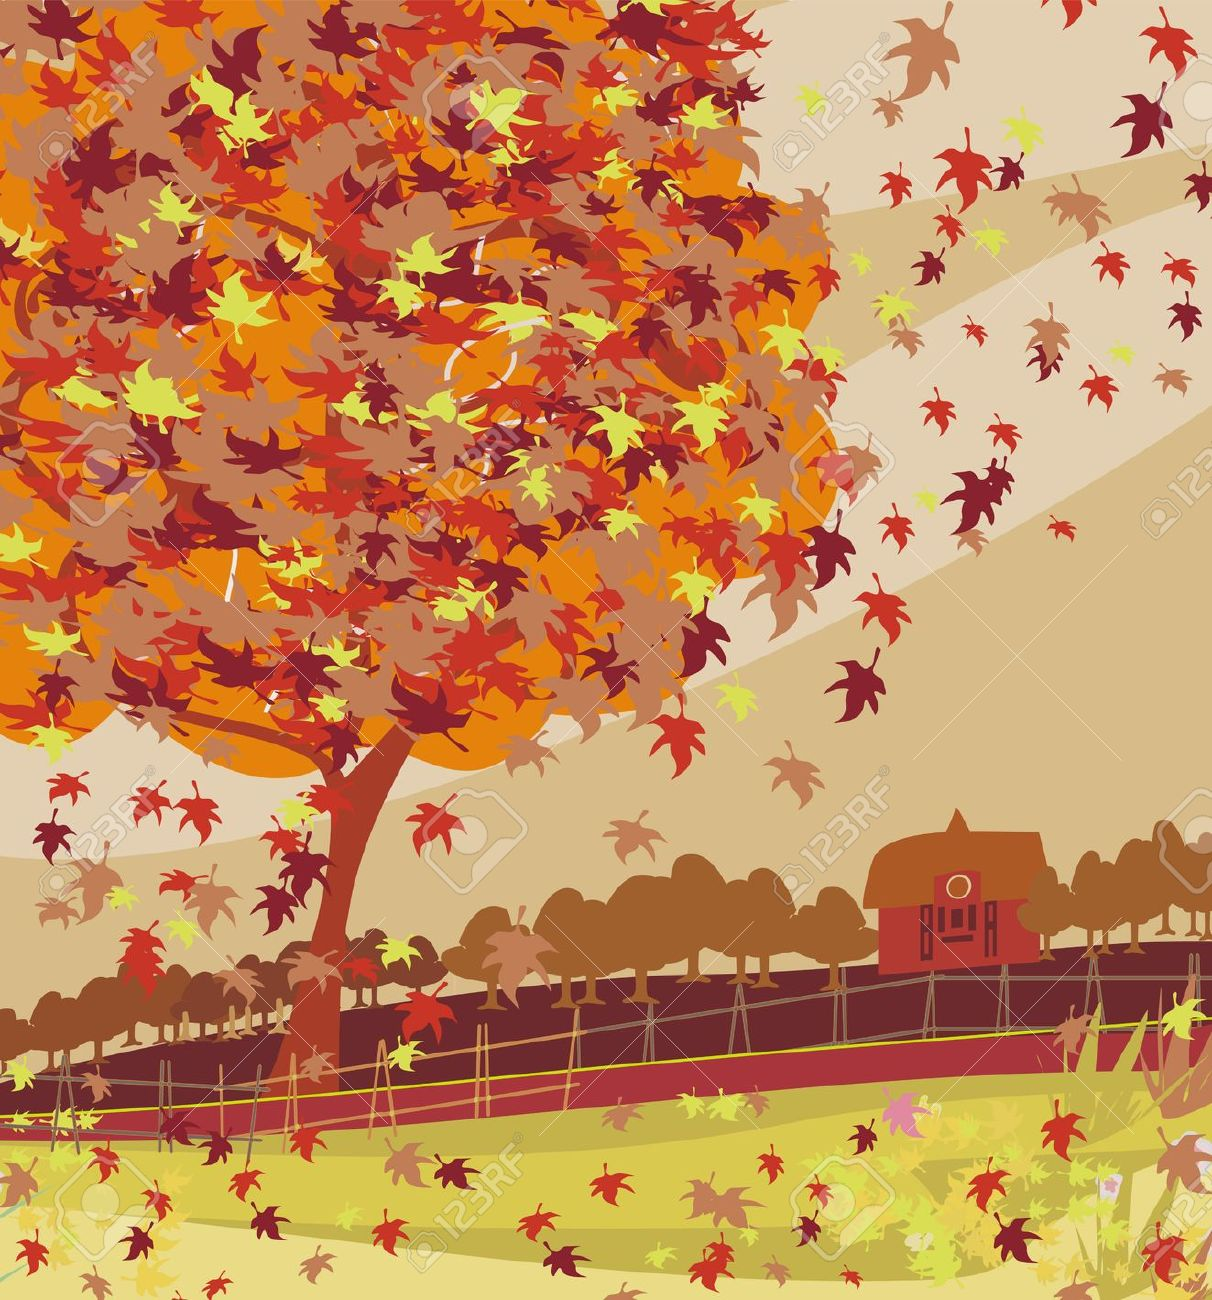 Fall scenery clipart.